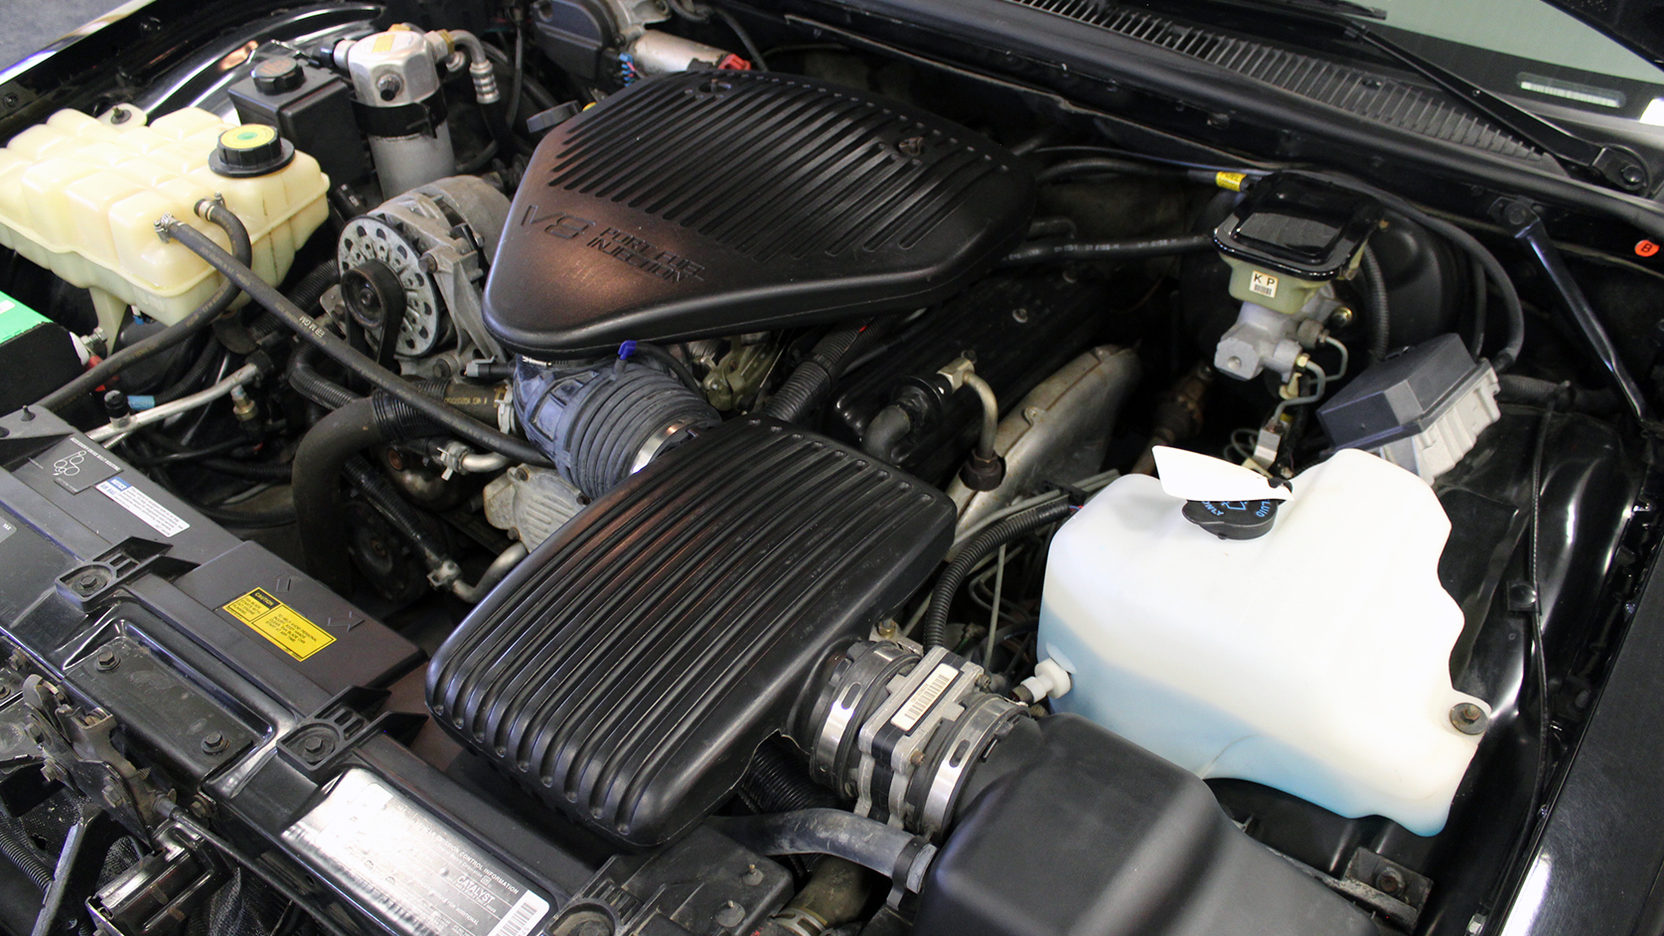 1995 Chevrolet Impala SS engine